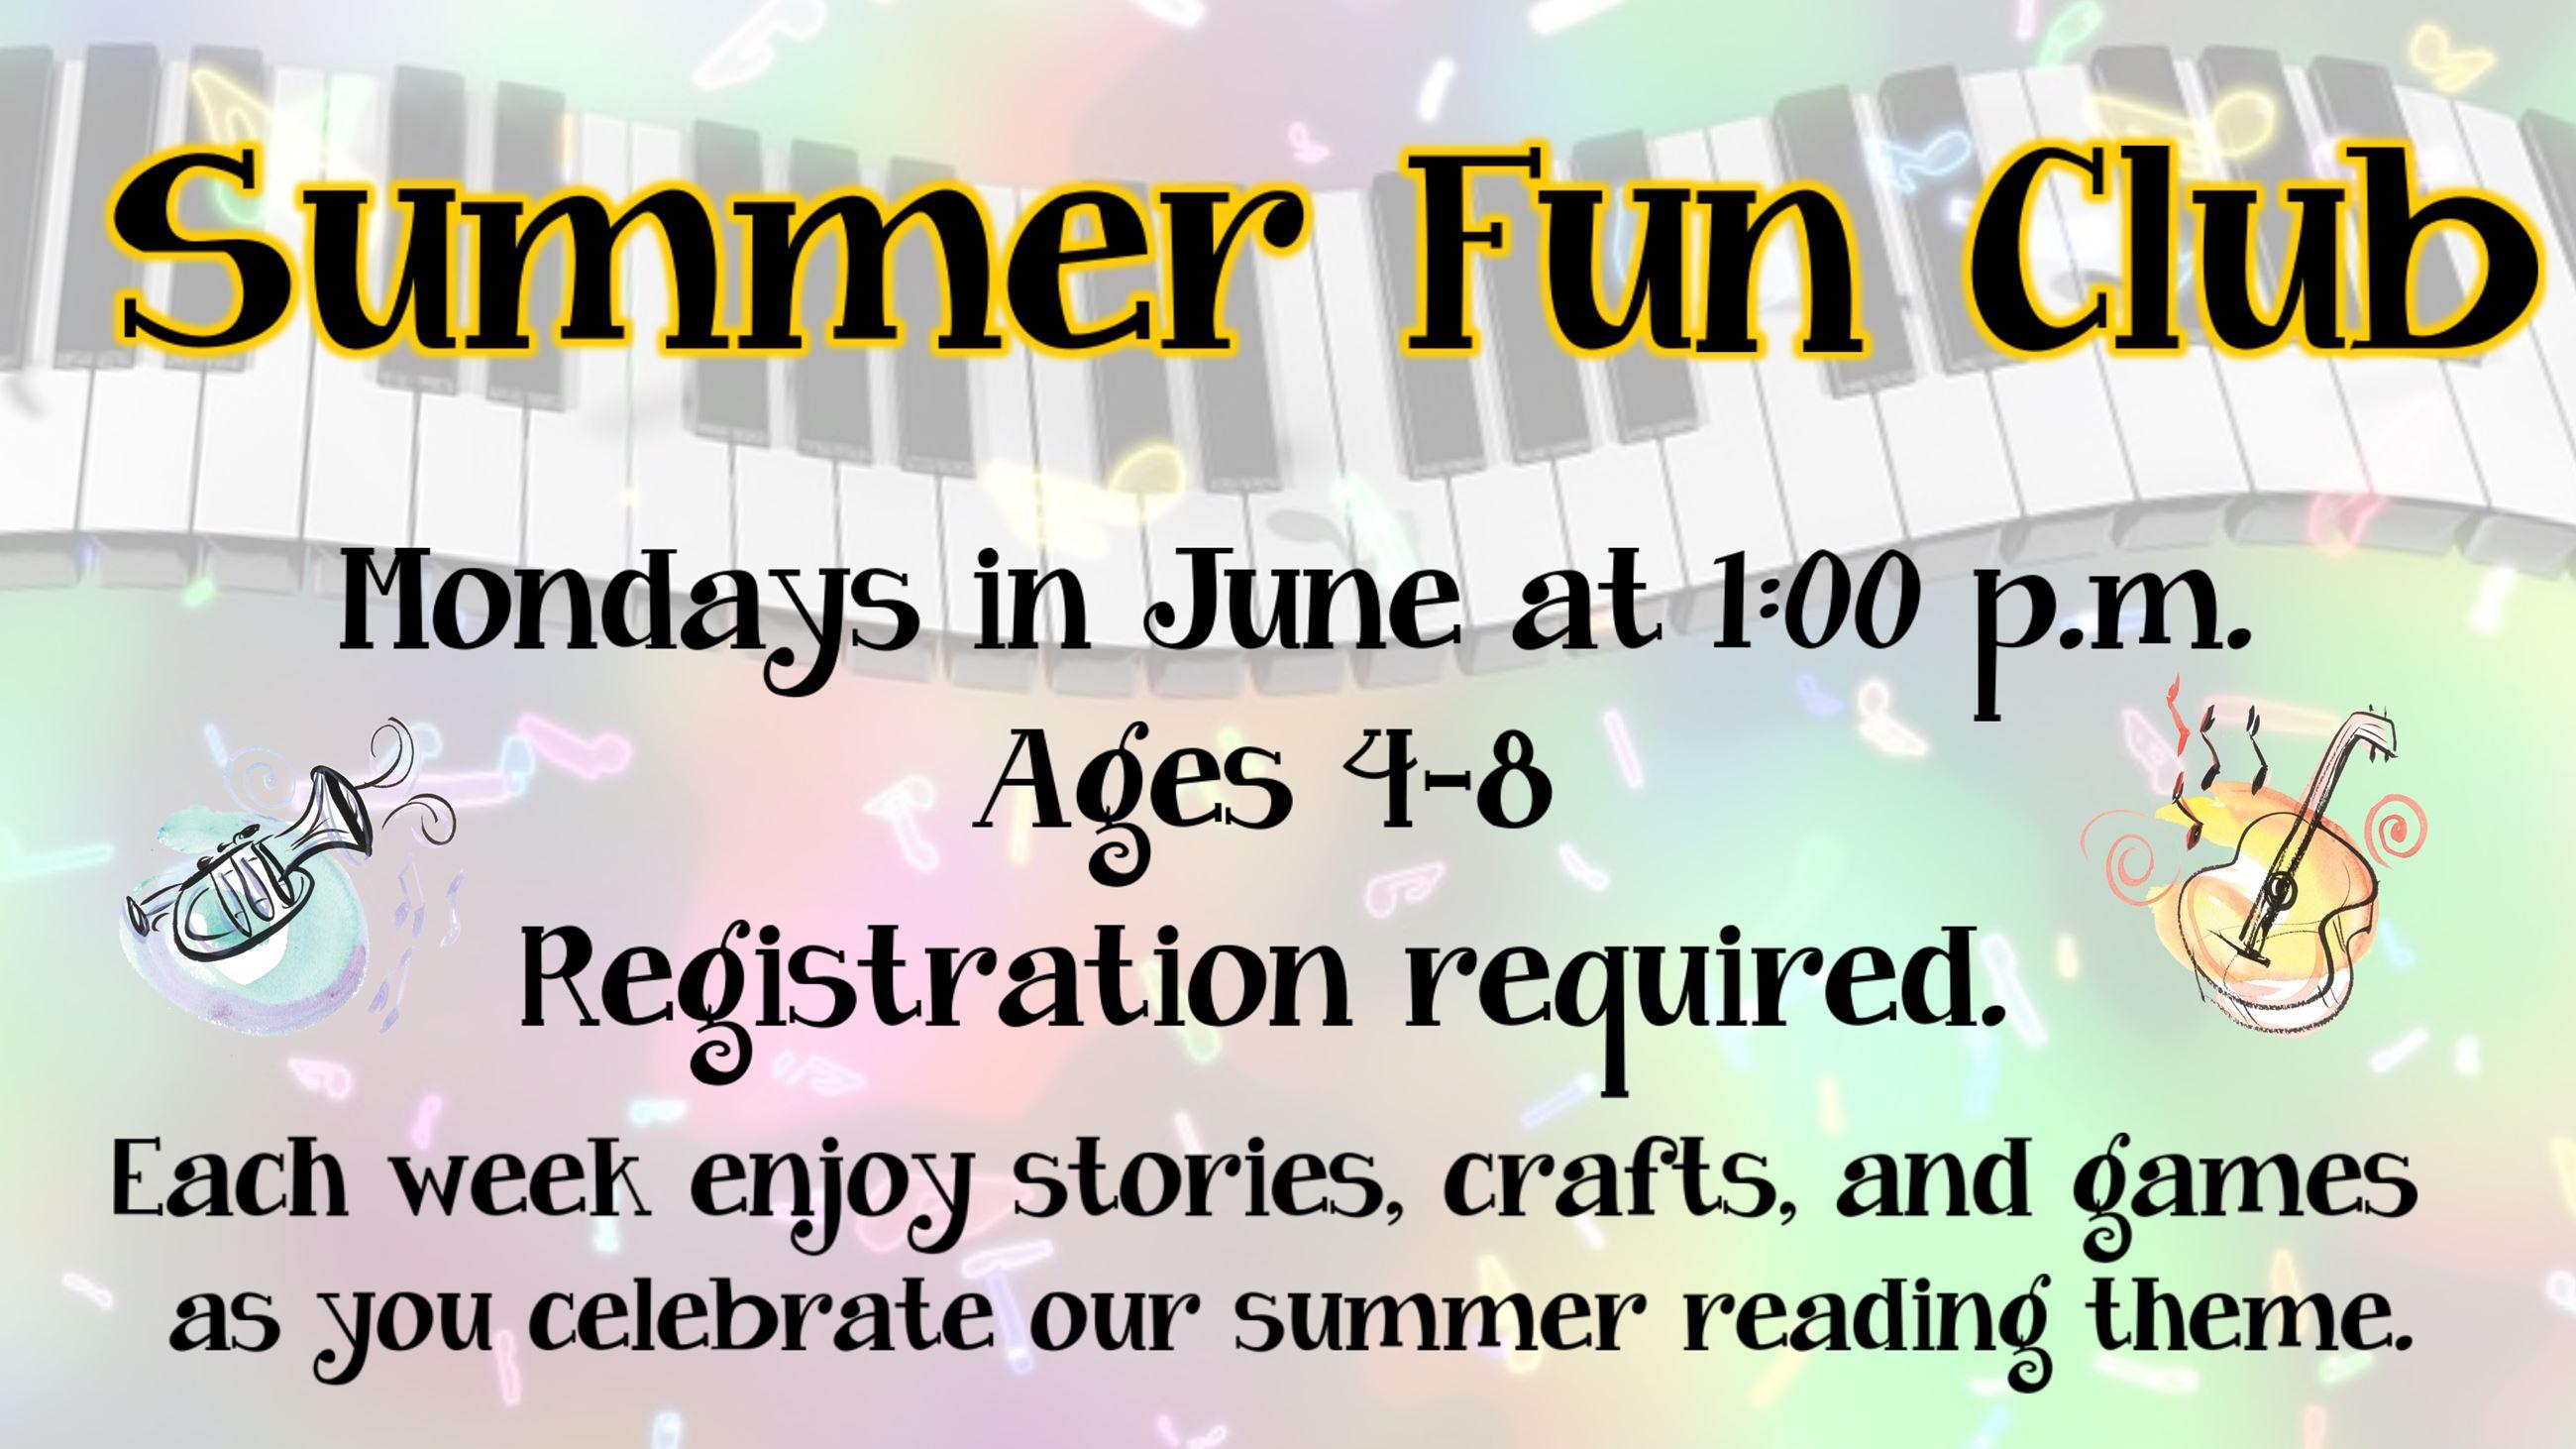 Summer Fun Club